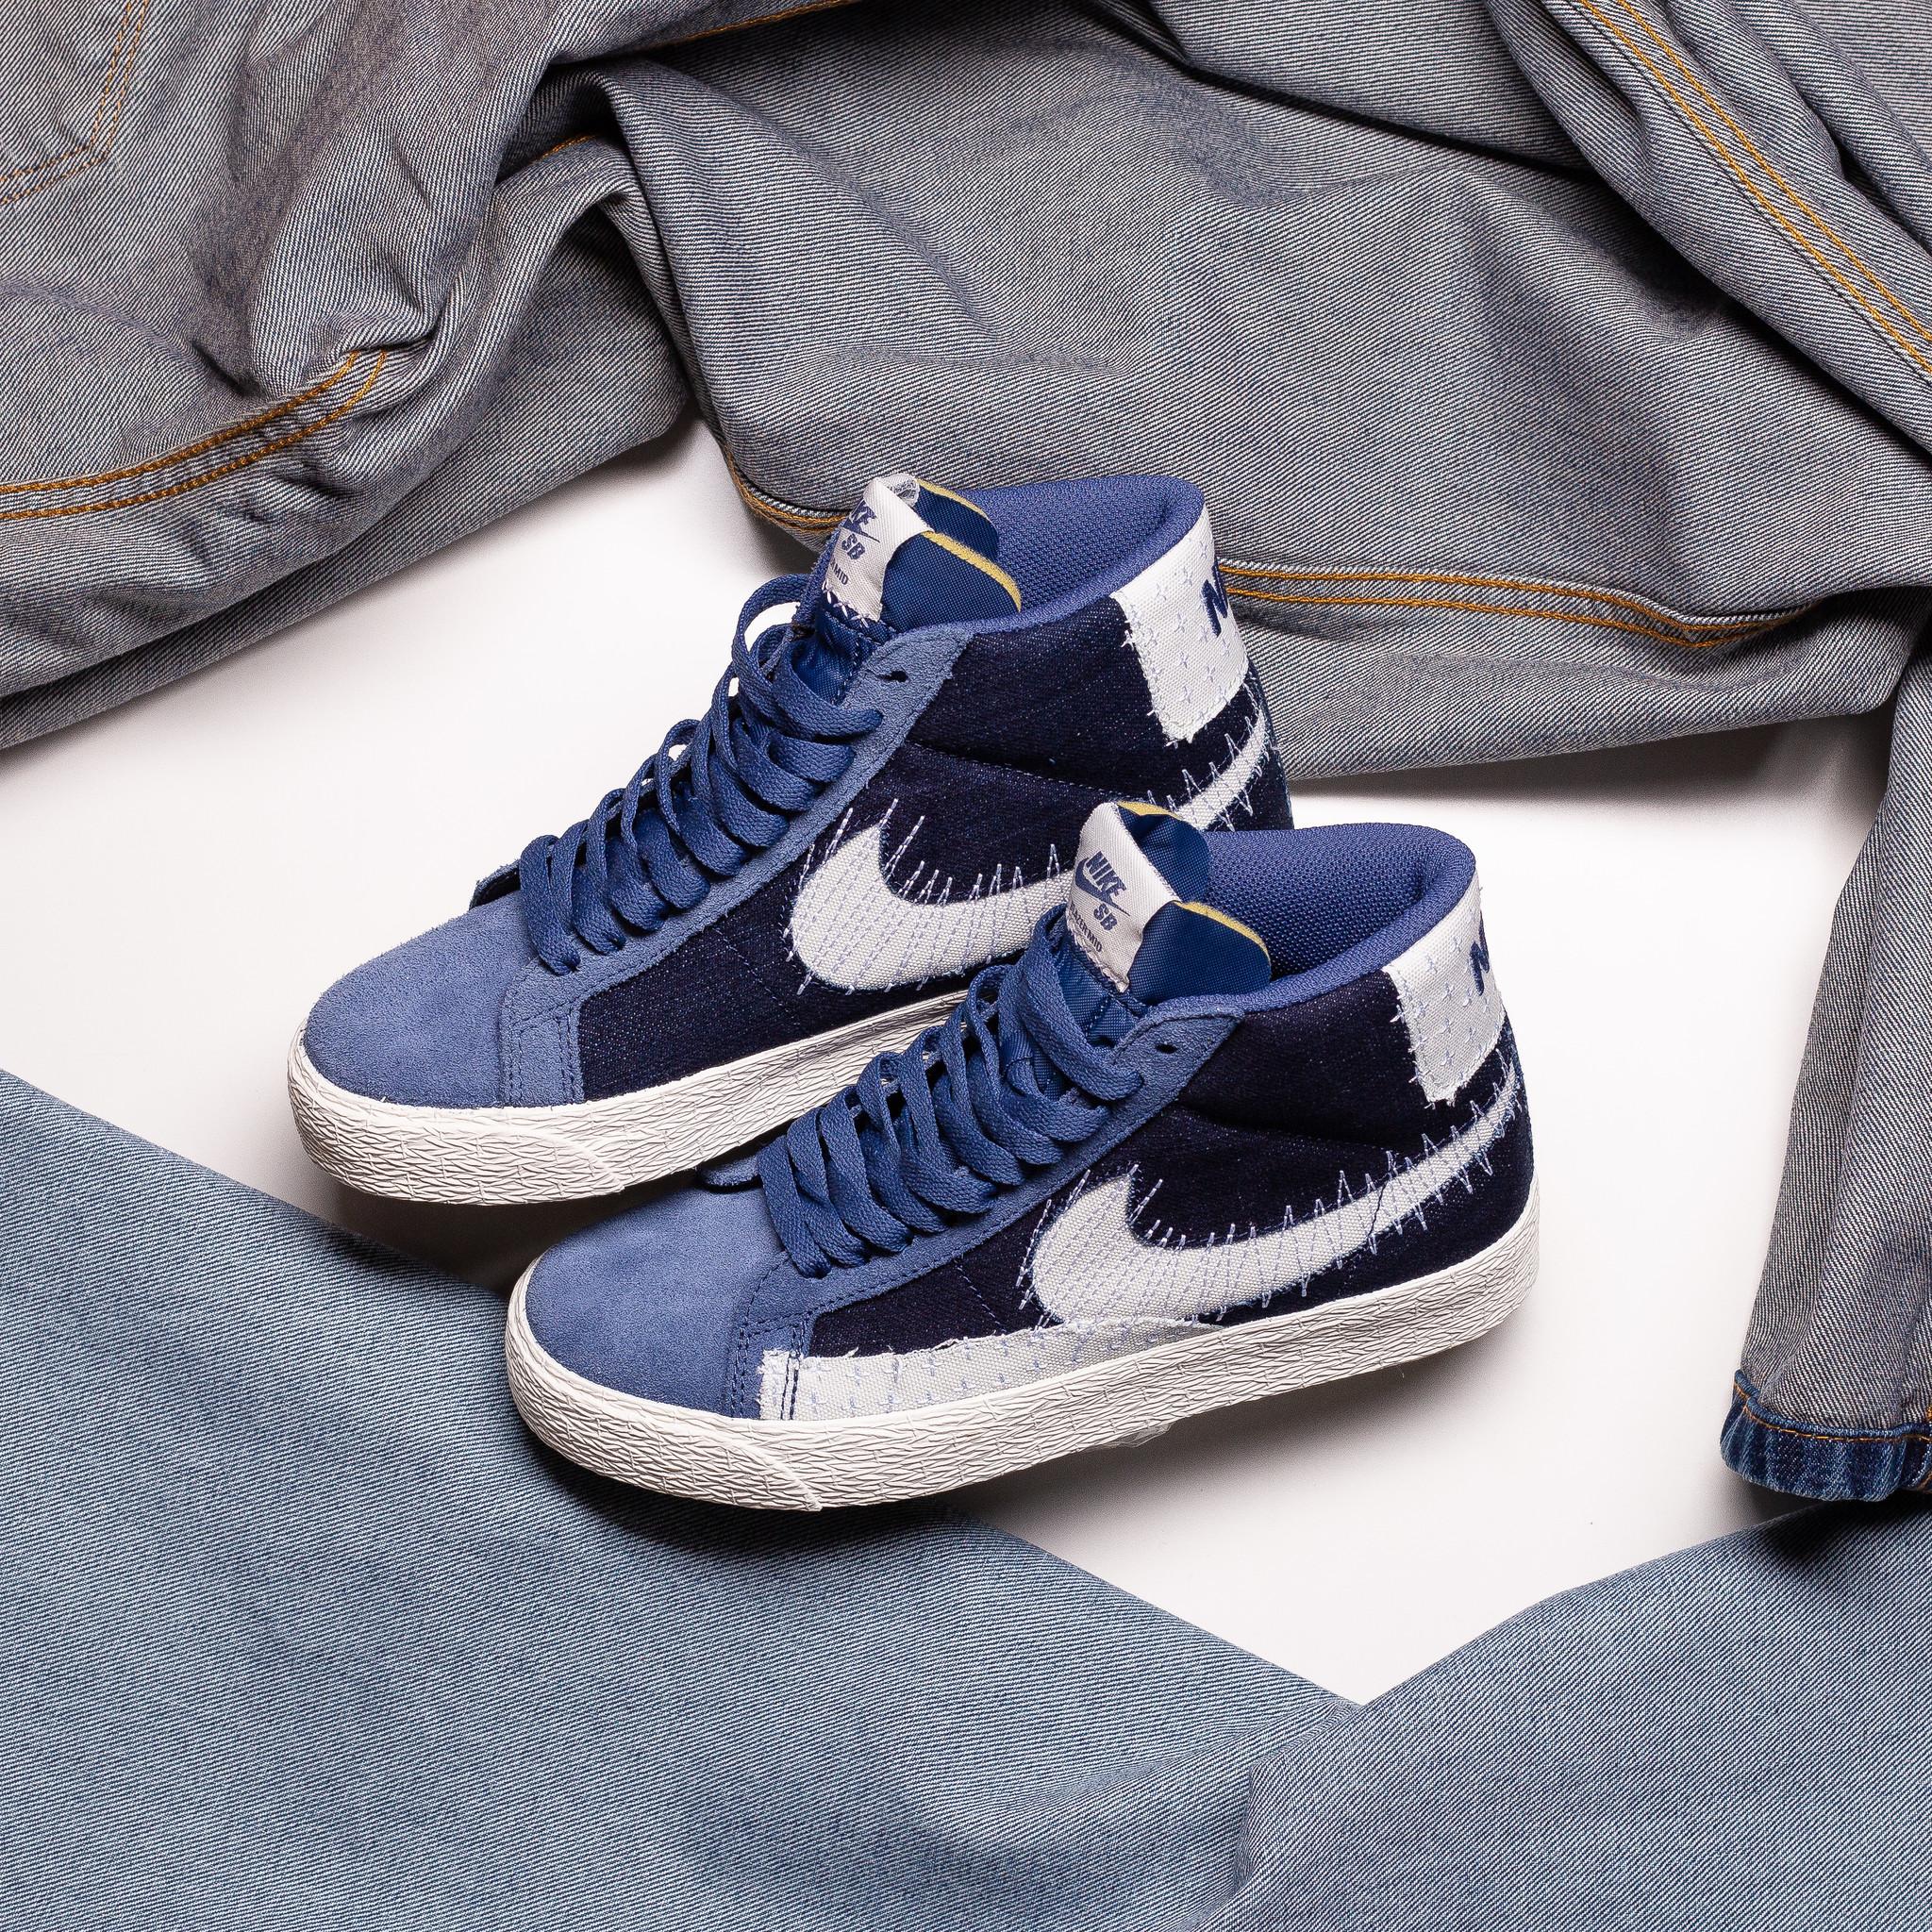 Nike SB Blazer Mid Sashiko Mystic Navy